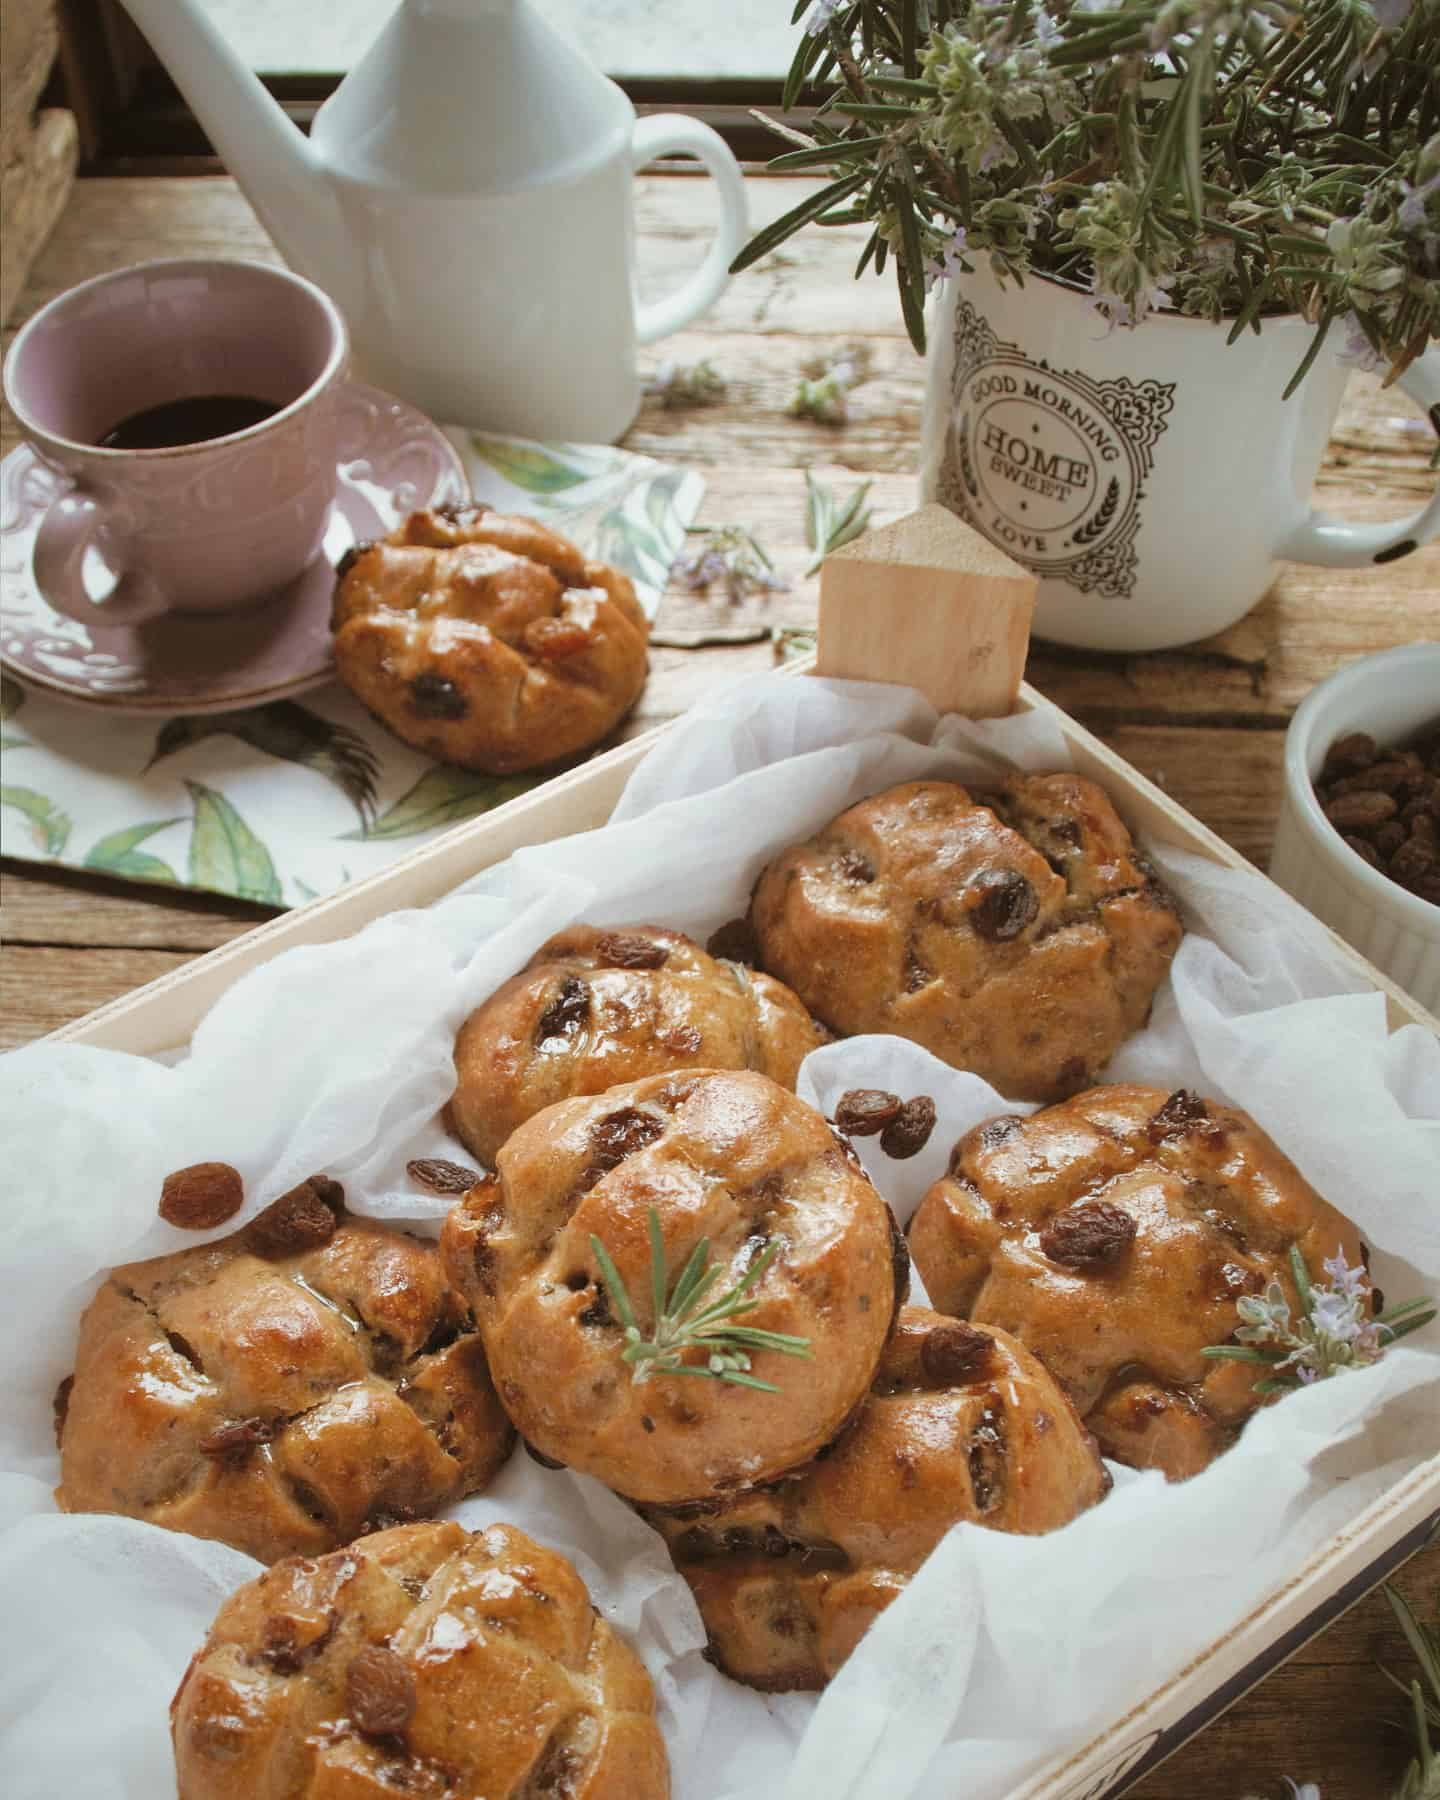 Pan di ramerino dal sapore antico